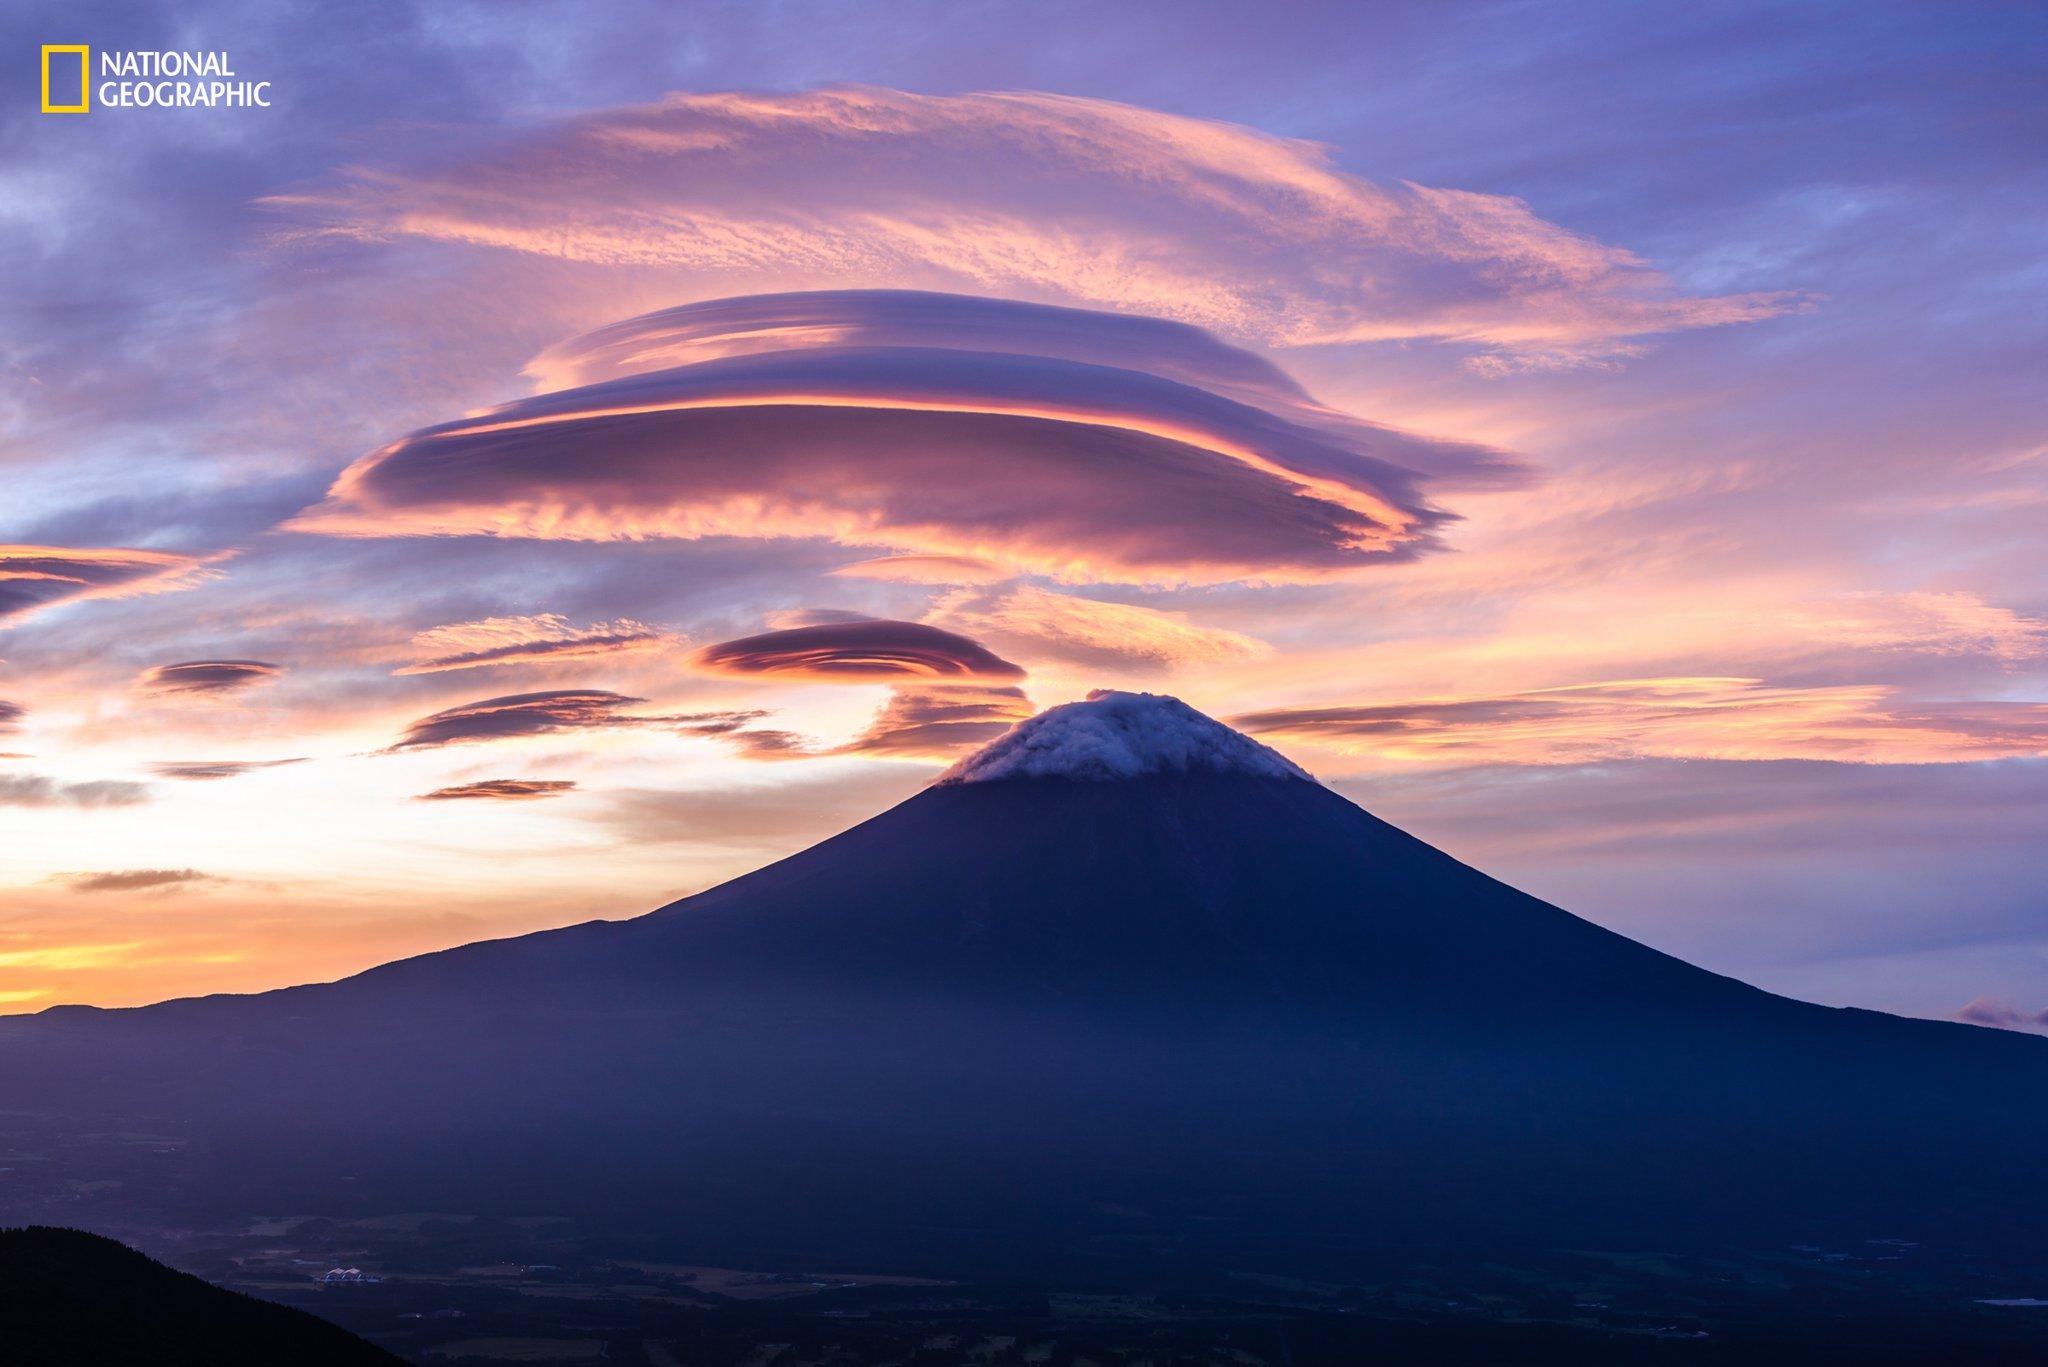 ufo-formation